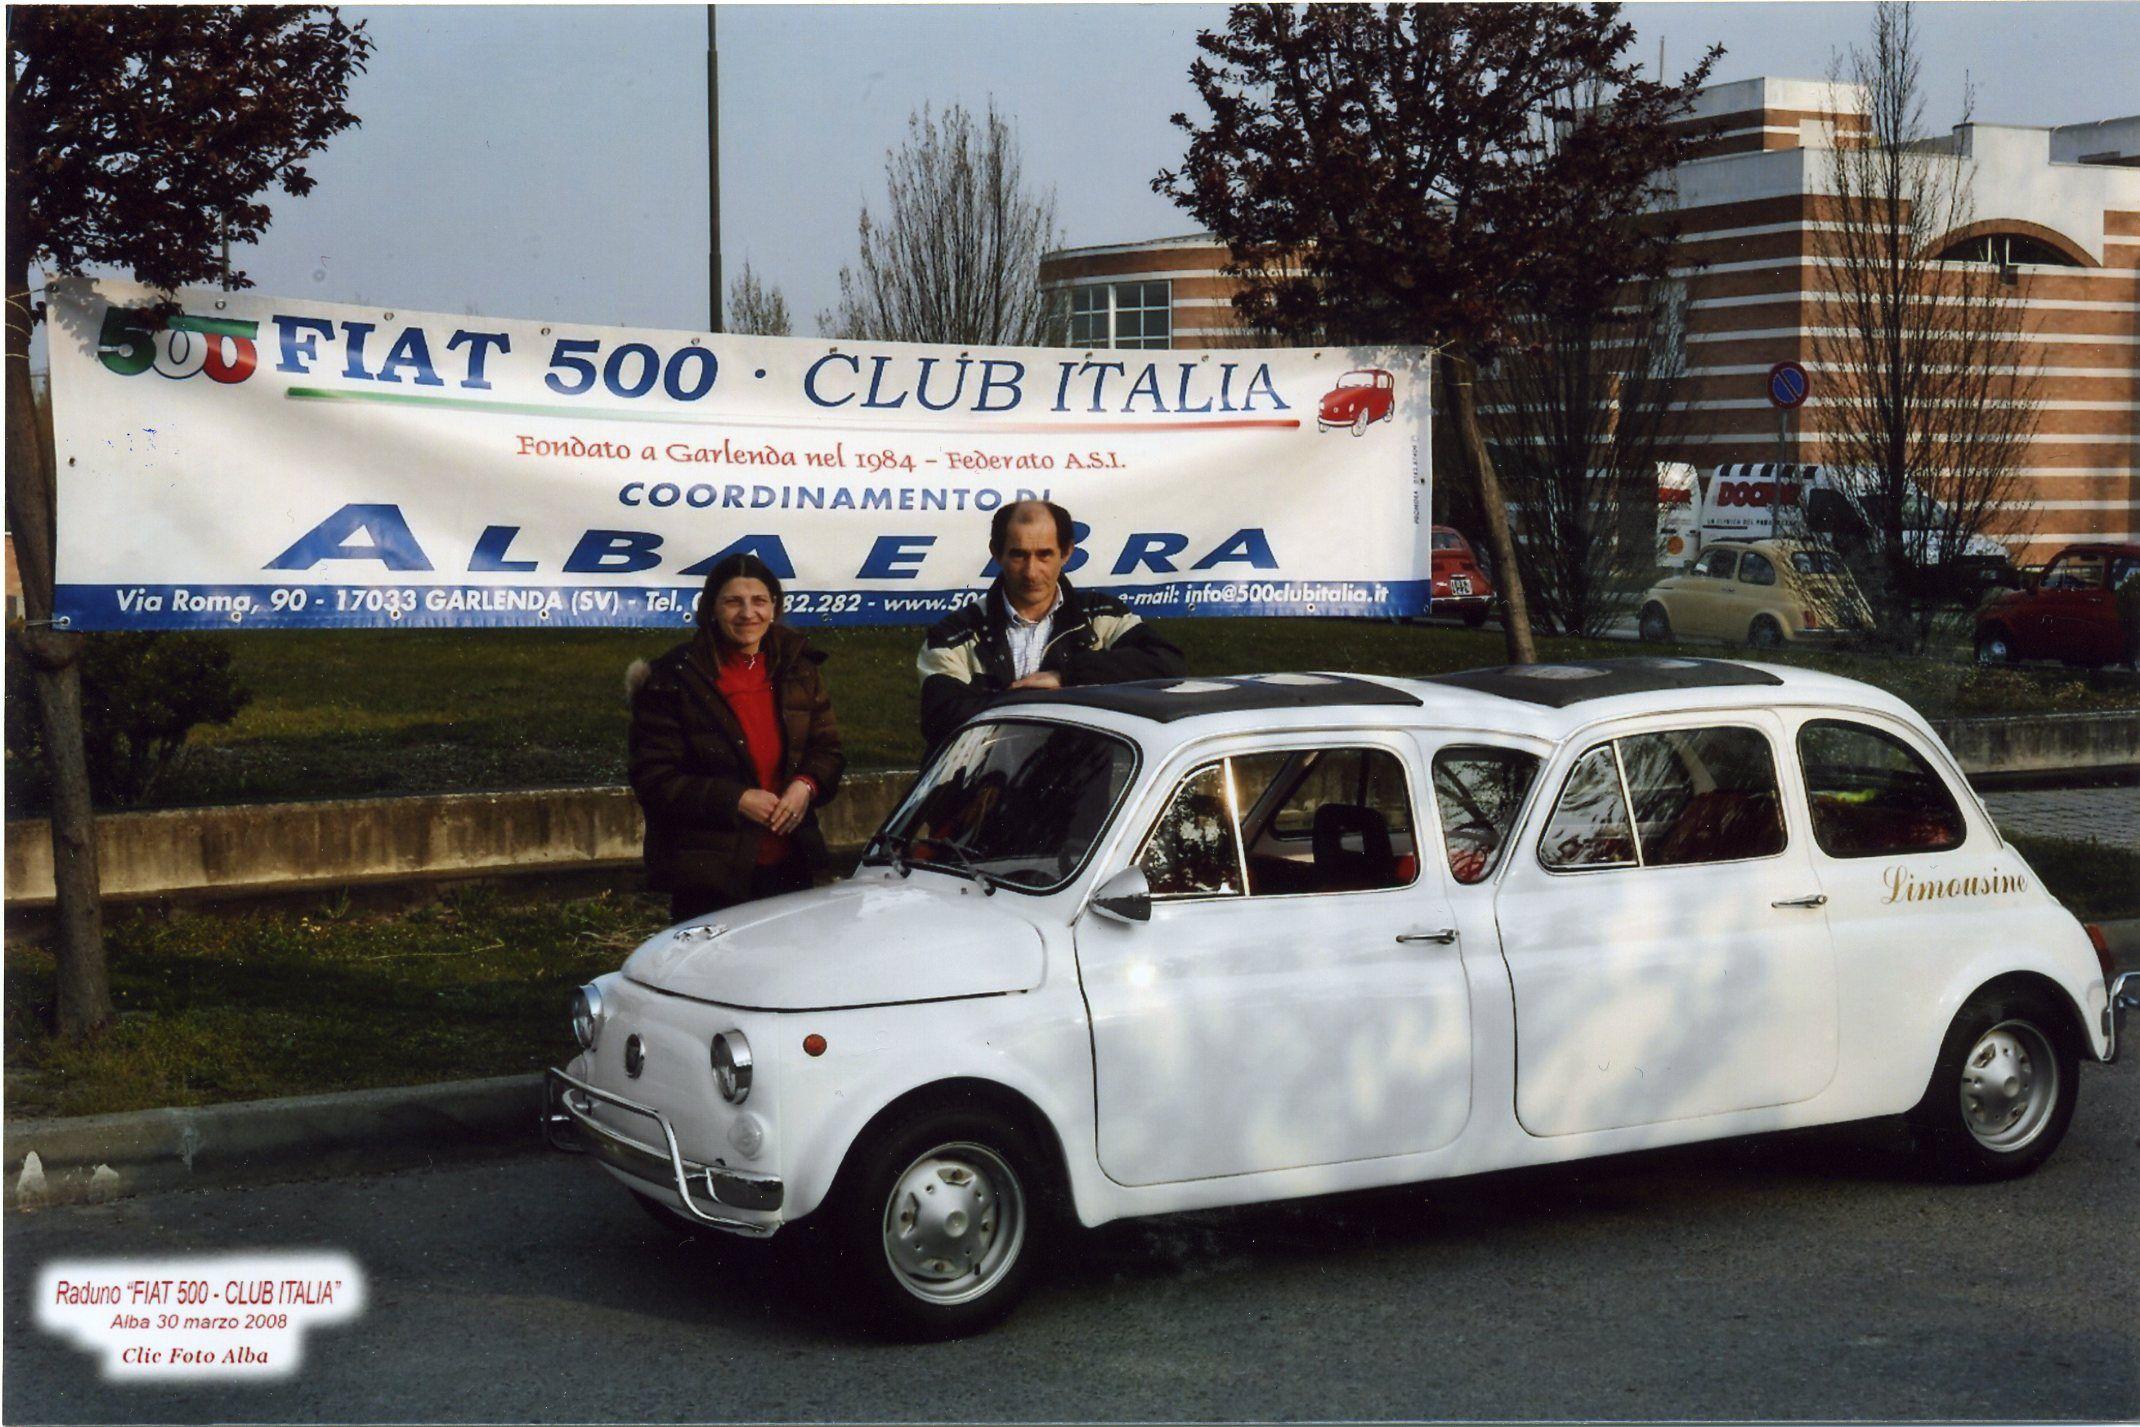 fiat 500 limousine during a fiat 500 club italia meeting fiat4fun pinterest fiat cars and. Black Bedroom Furniture Sets. Home Design Ideas